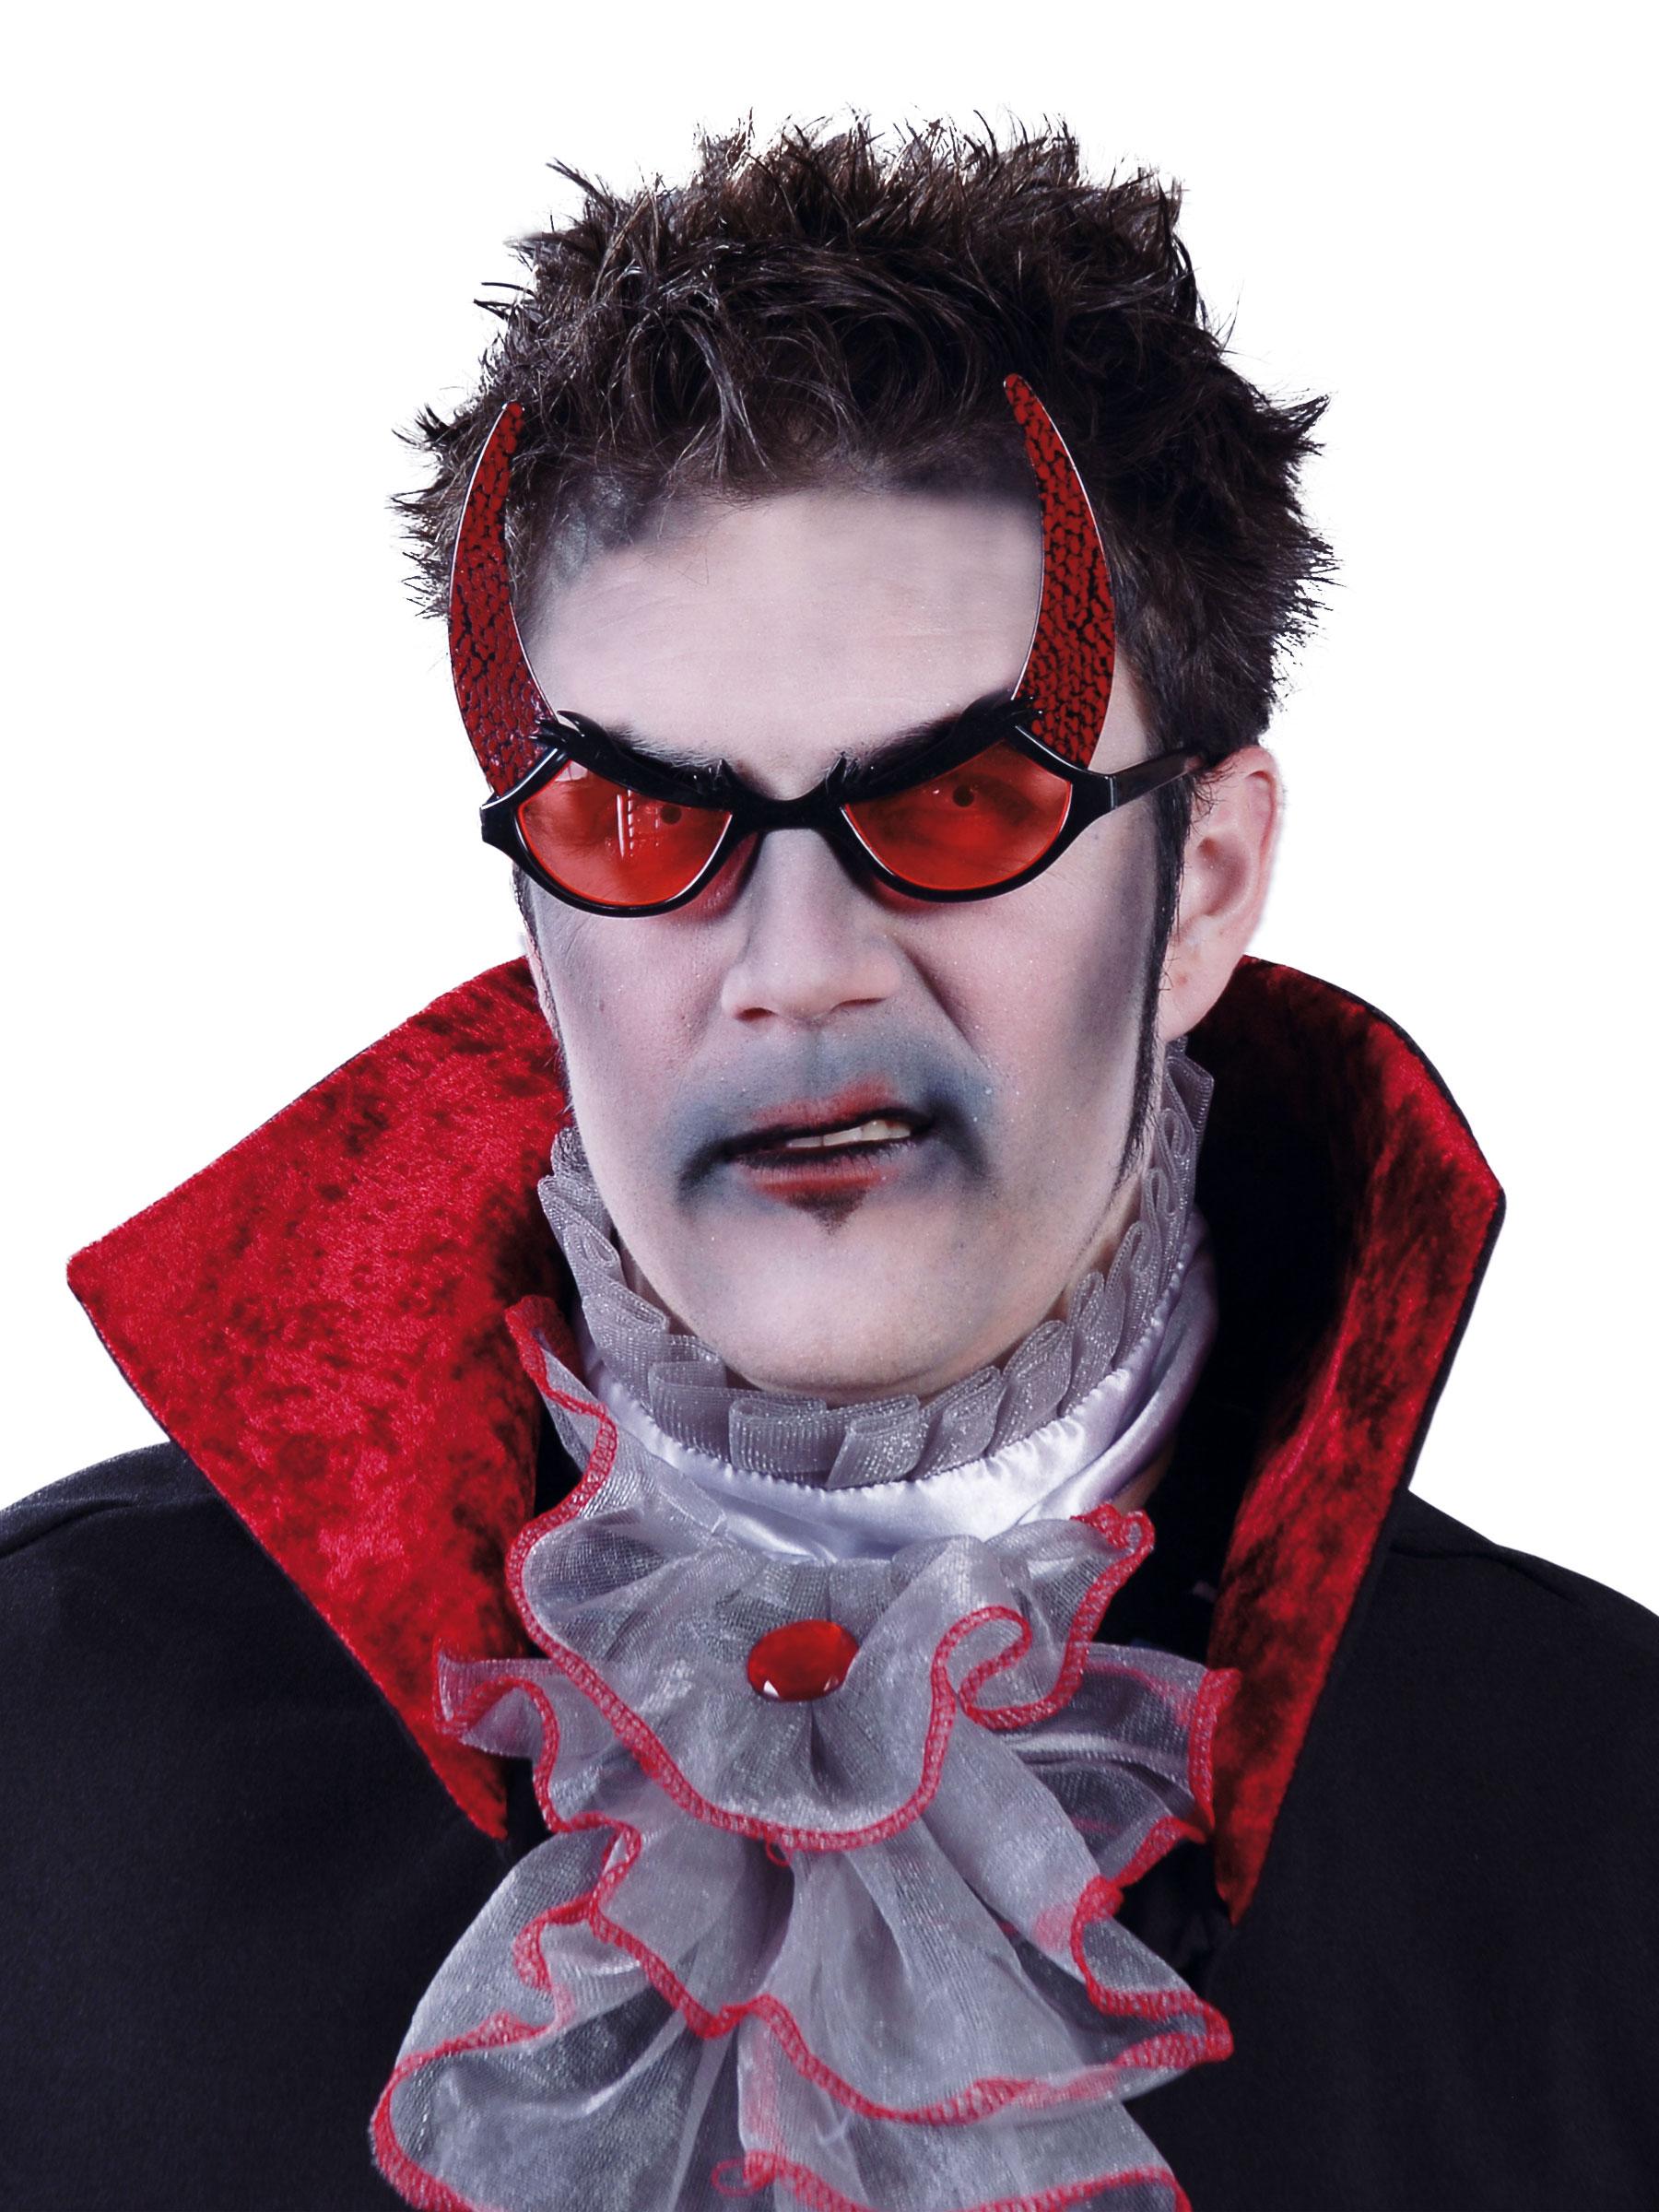 Lunettes d mon adulte halloween deguise toi achat de - Halloween adulte ...